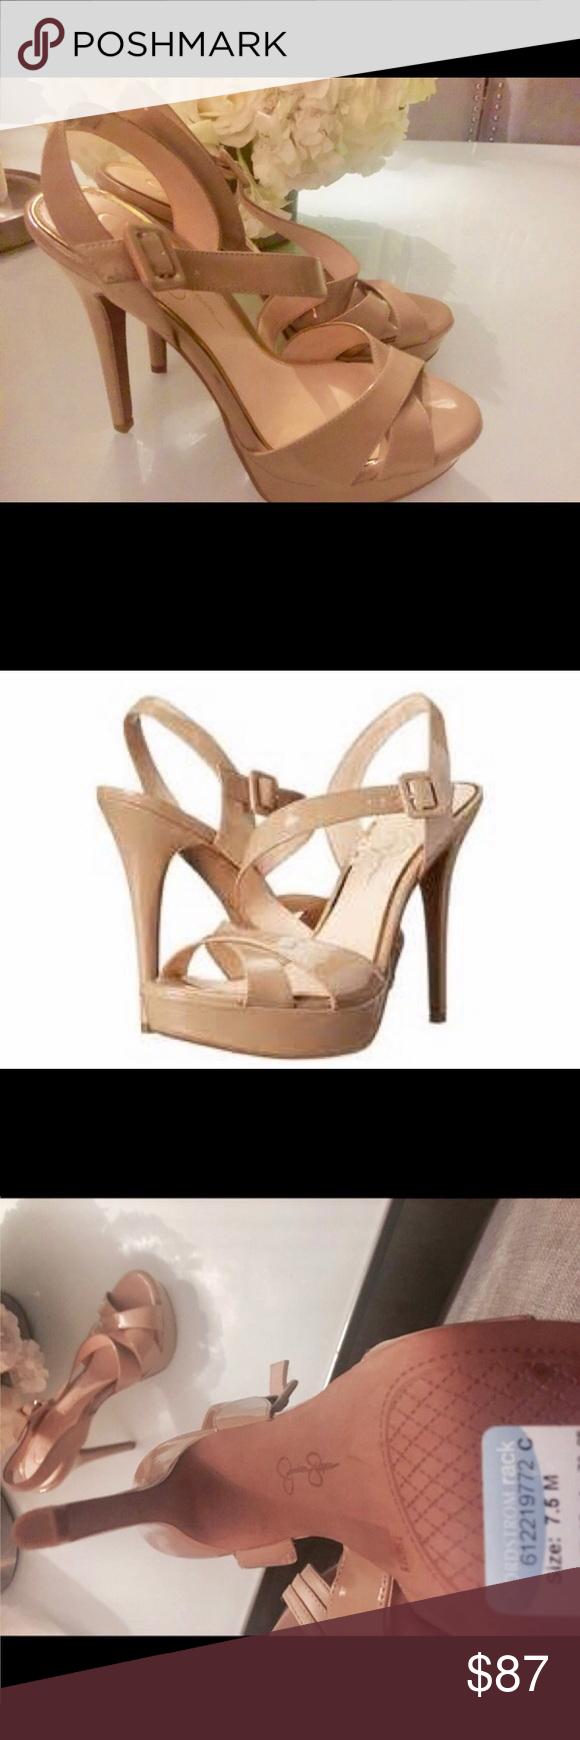 Jessica Simpson 'Beverlie'nude platform sandal 7.5 Brand new Jessica Simpson platform sandals size 7.5 patent nude Jessica Simpson Shoes Platforms